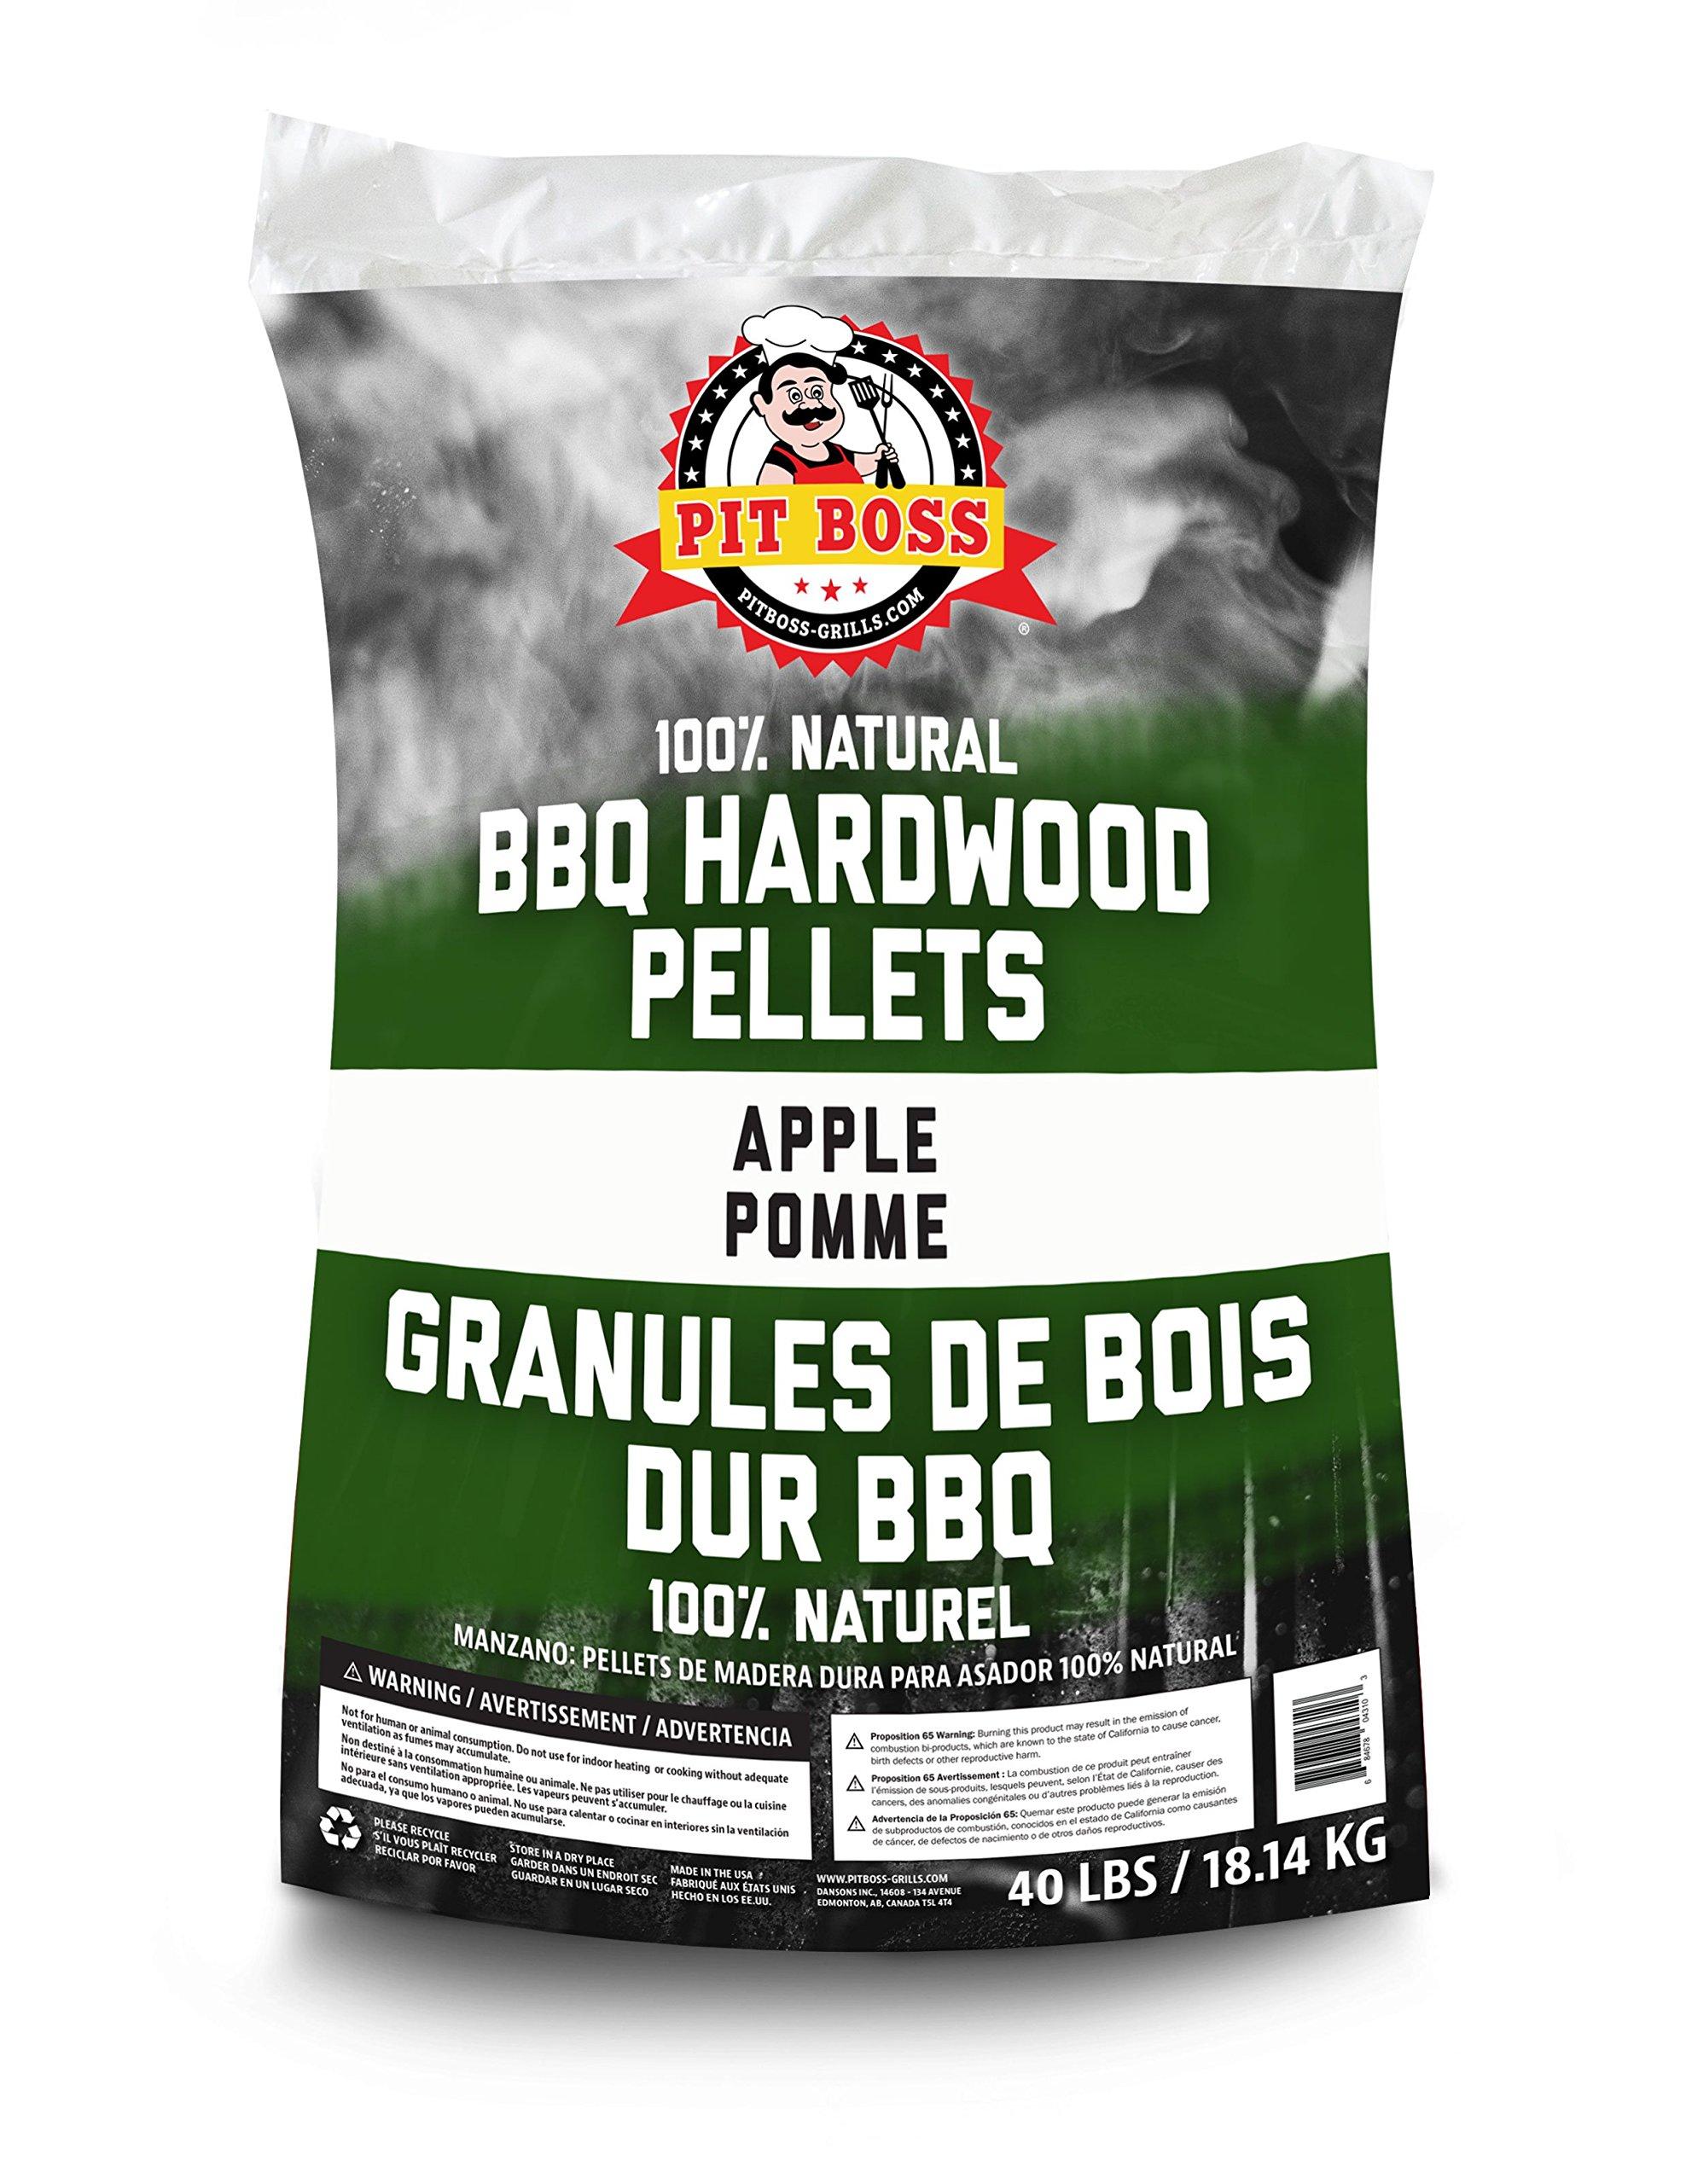 PIT BOSS 55433 BBQ Wood Pellets, 40 lb, Apple by PIT BOSS